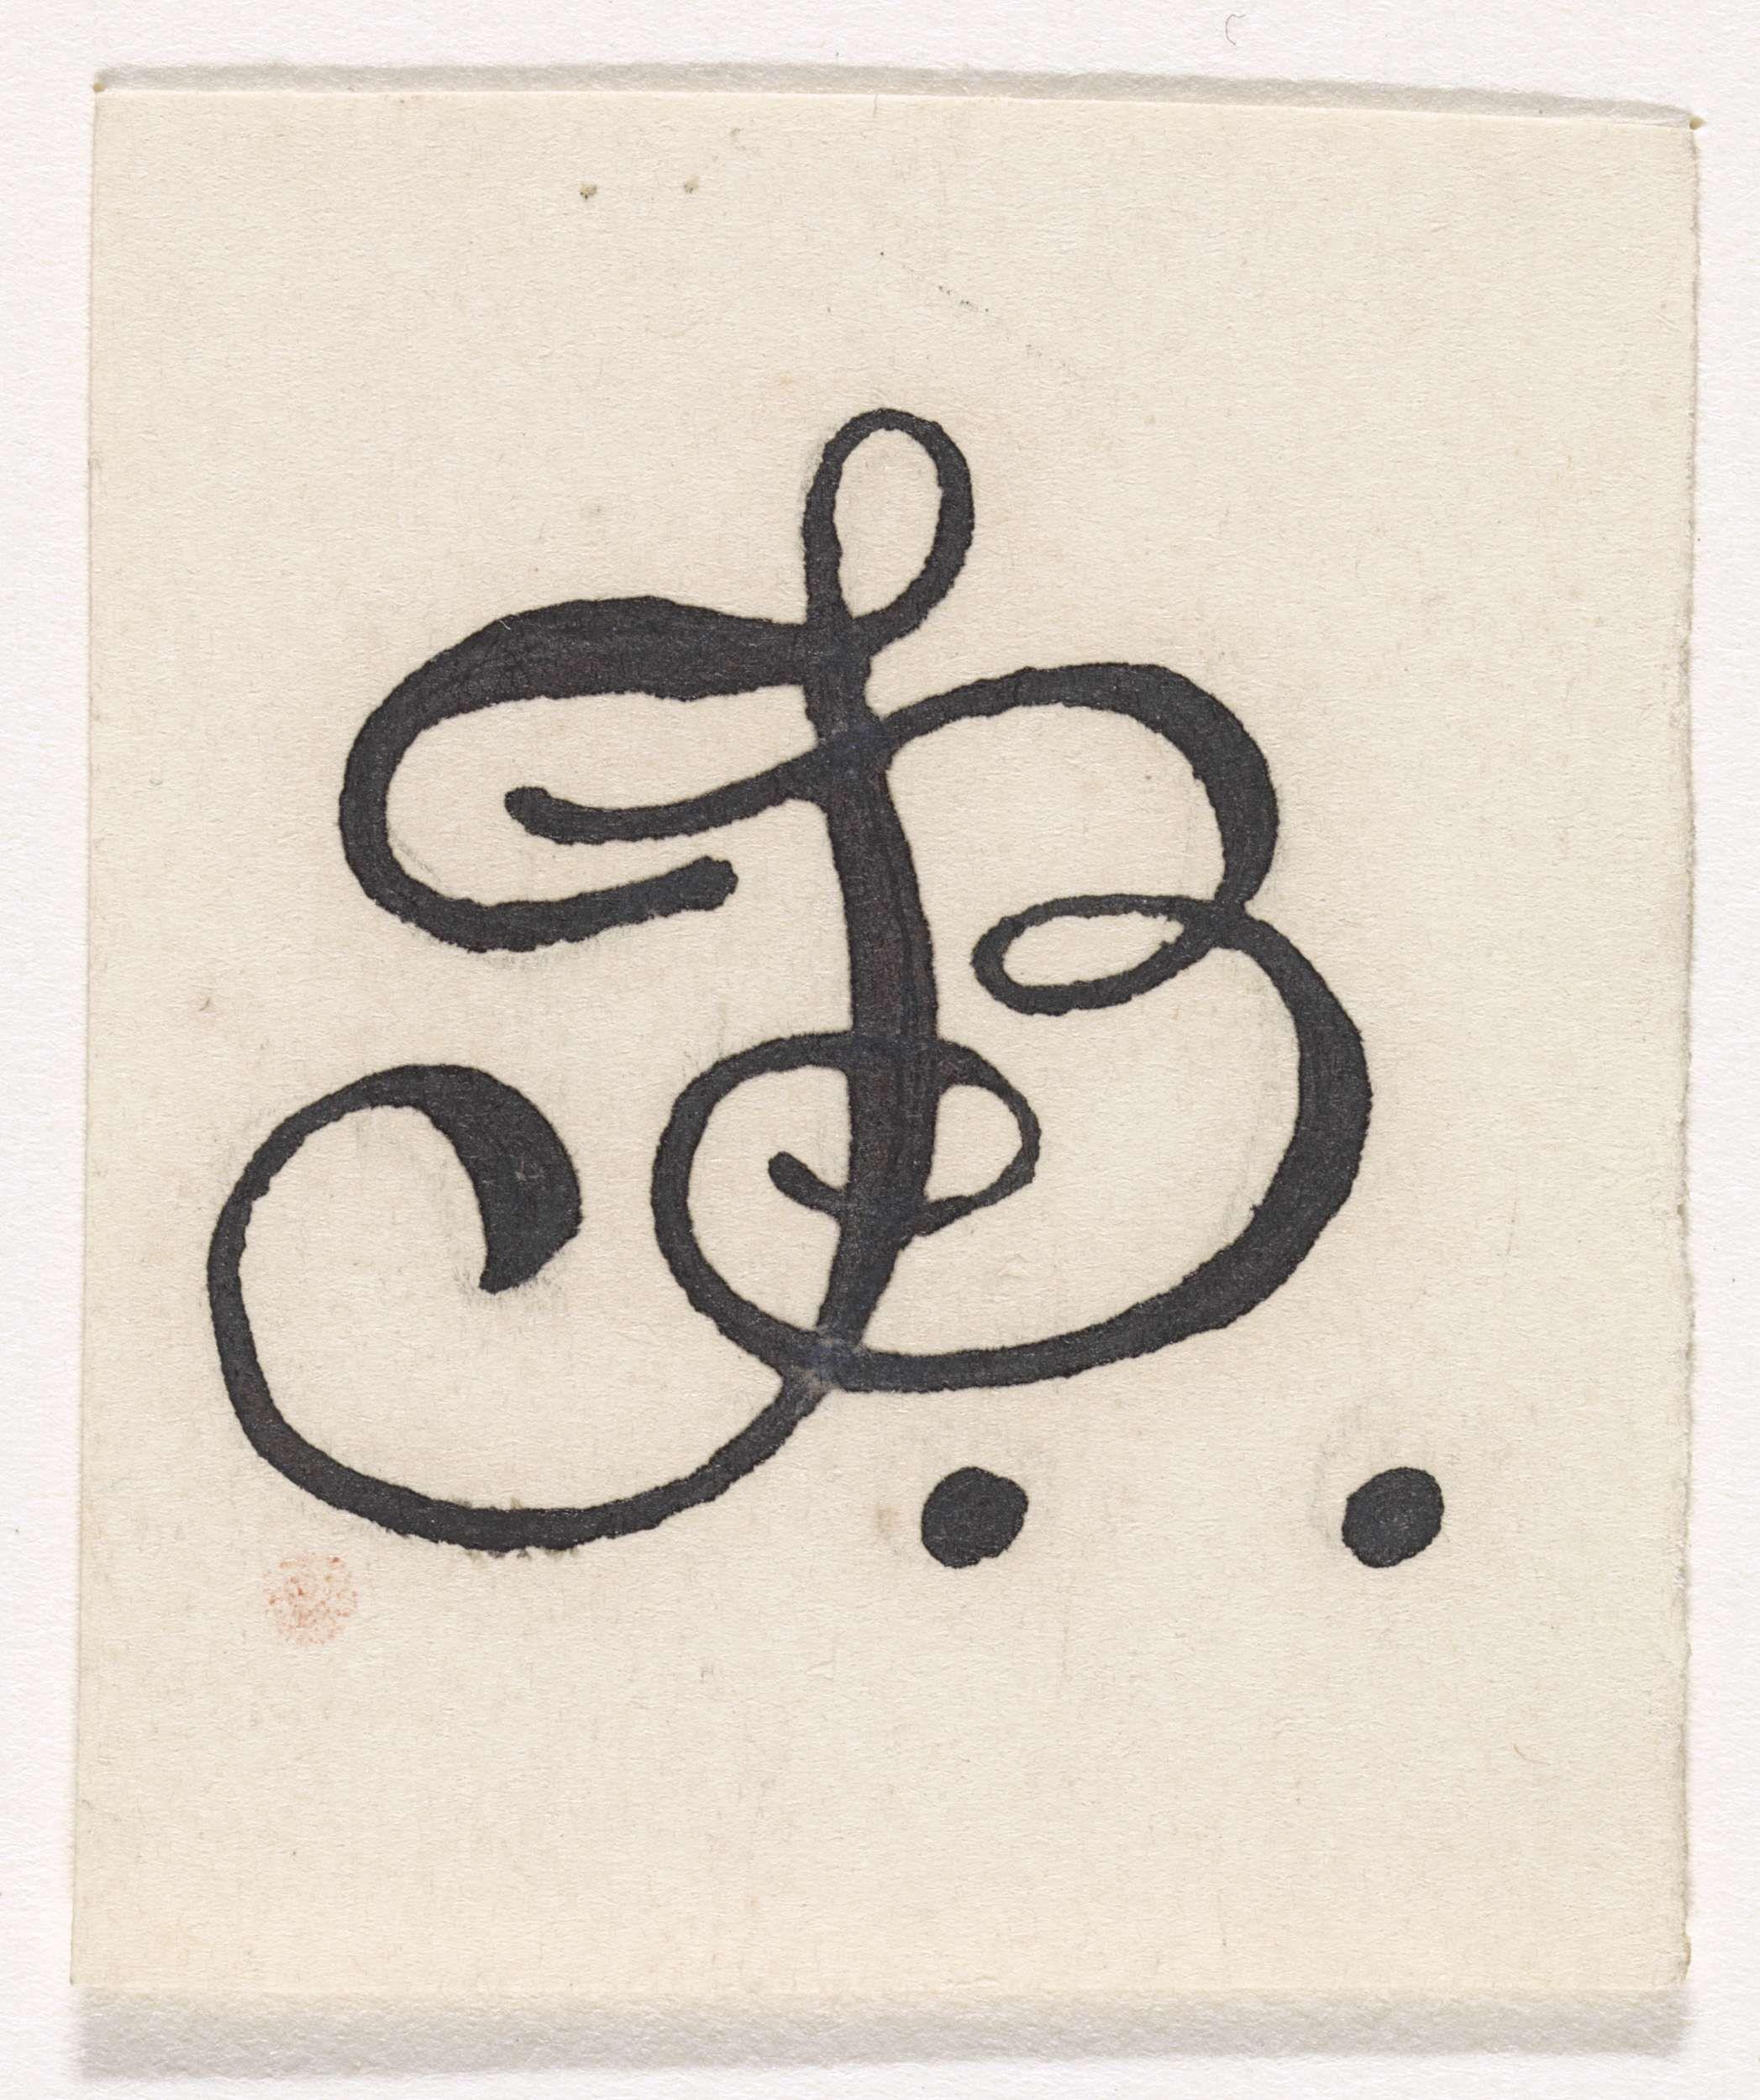 Letter B Print Alfabet Kalligrafie Typografie Monogram Bloemen